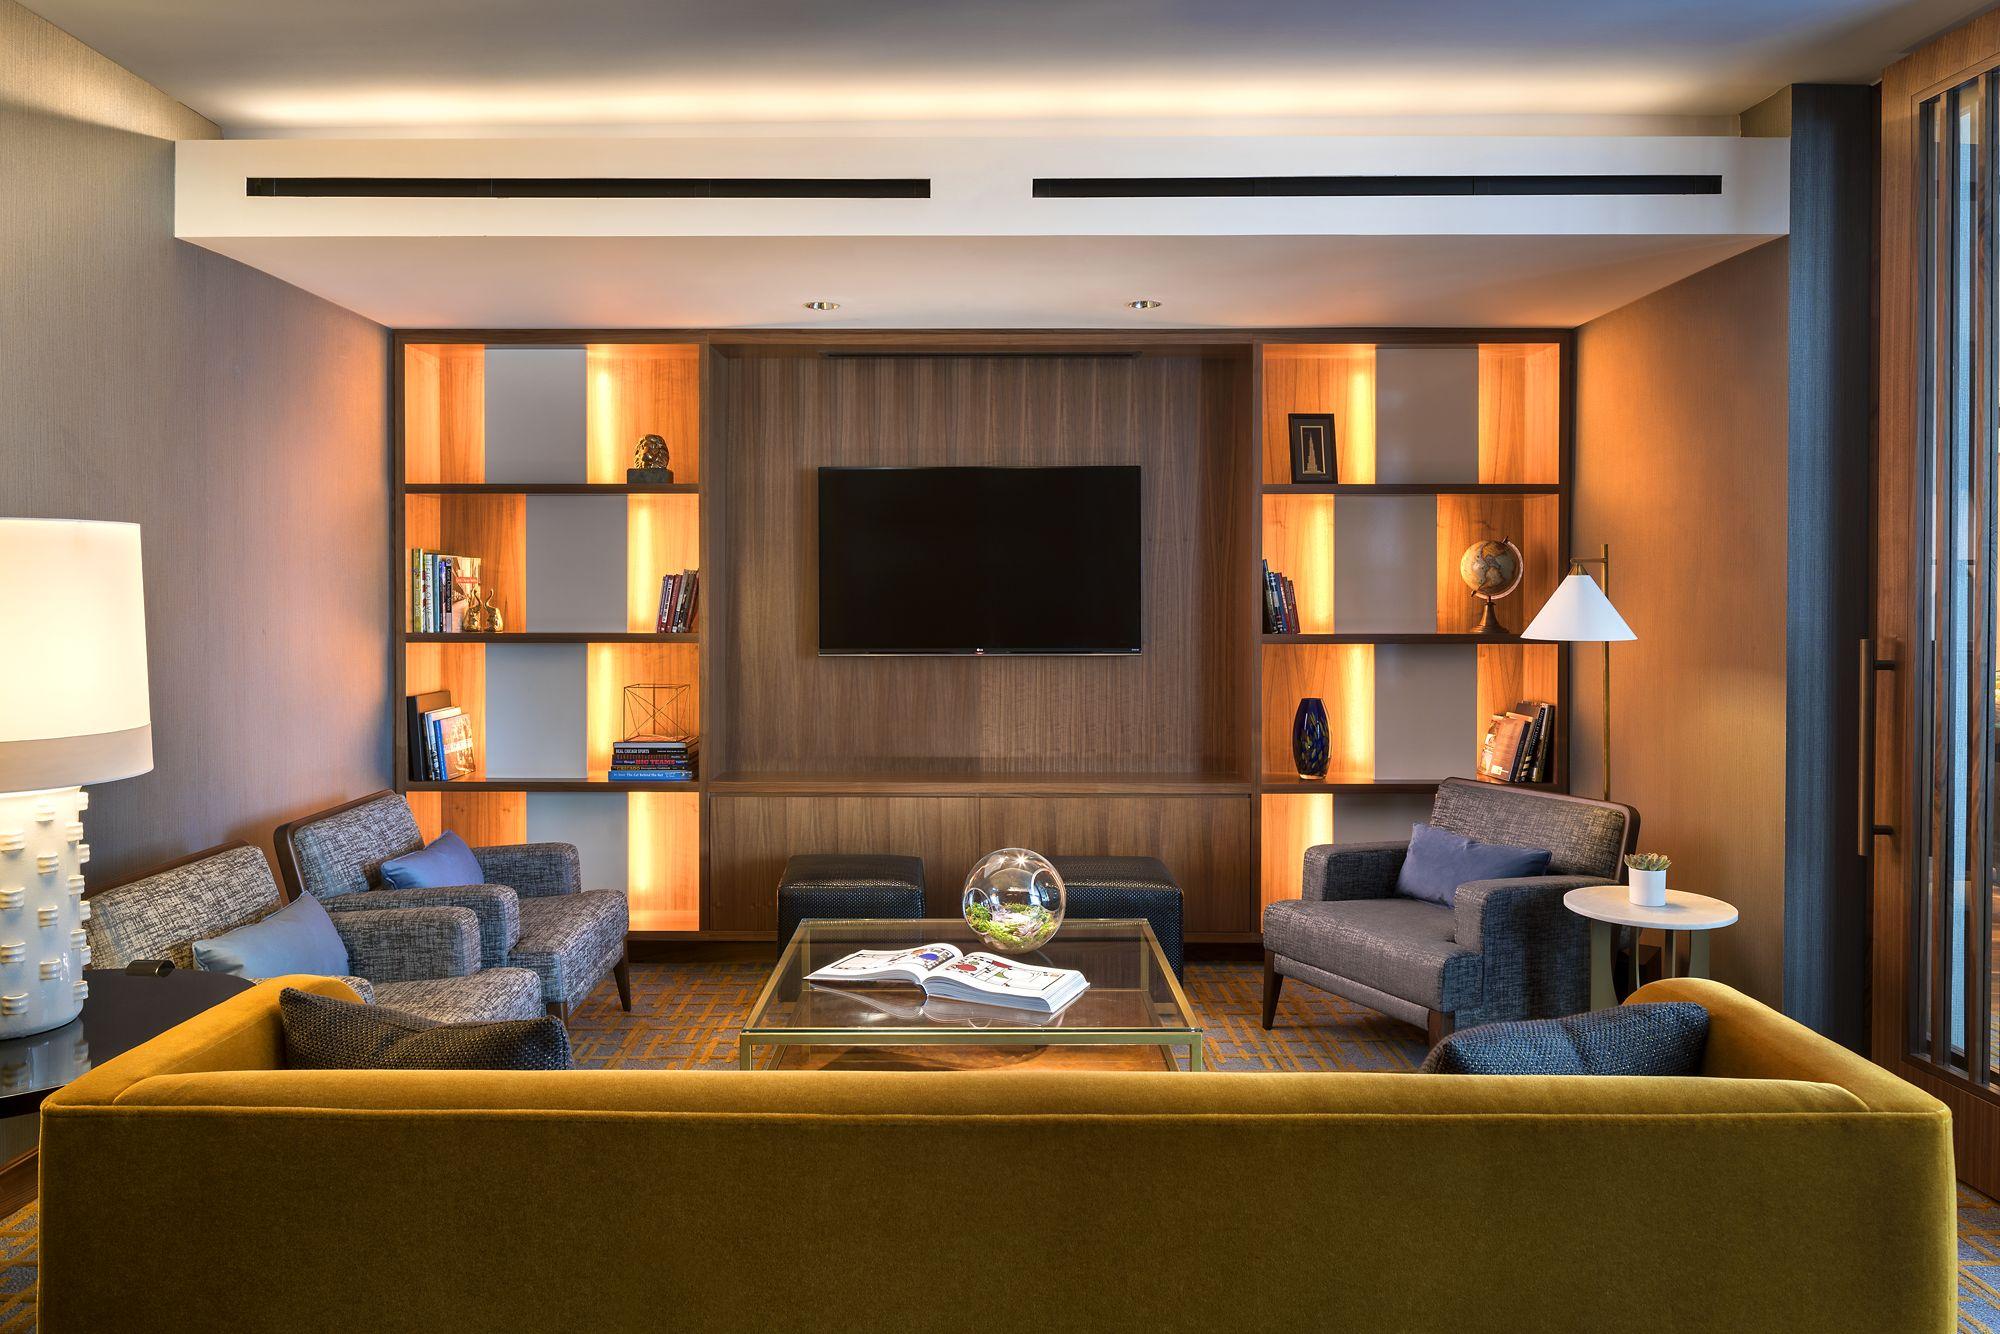 The Ritz-Carlton, Chicago image 5